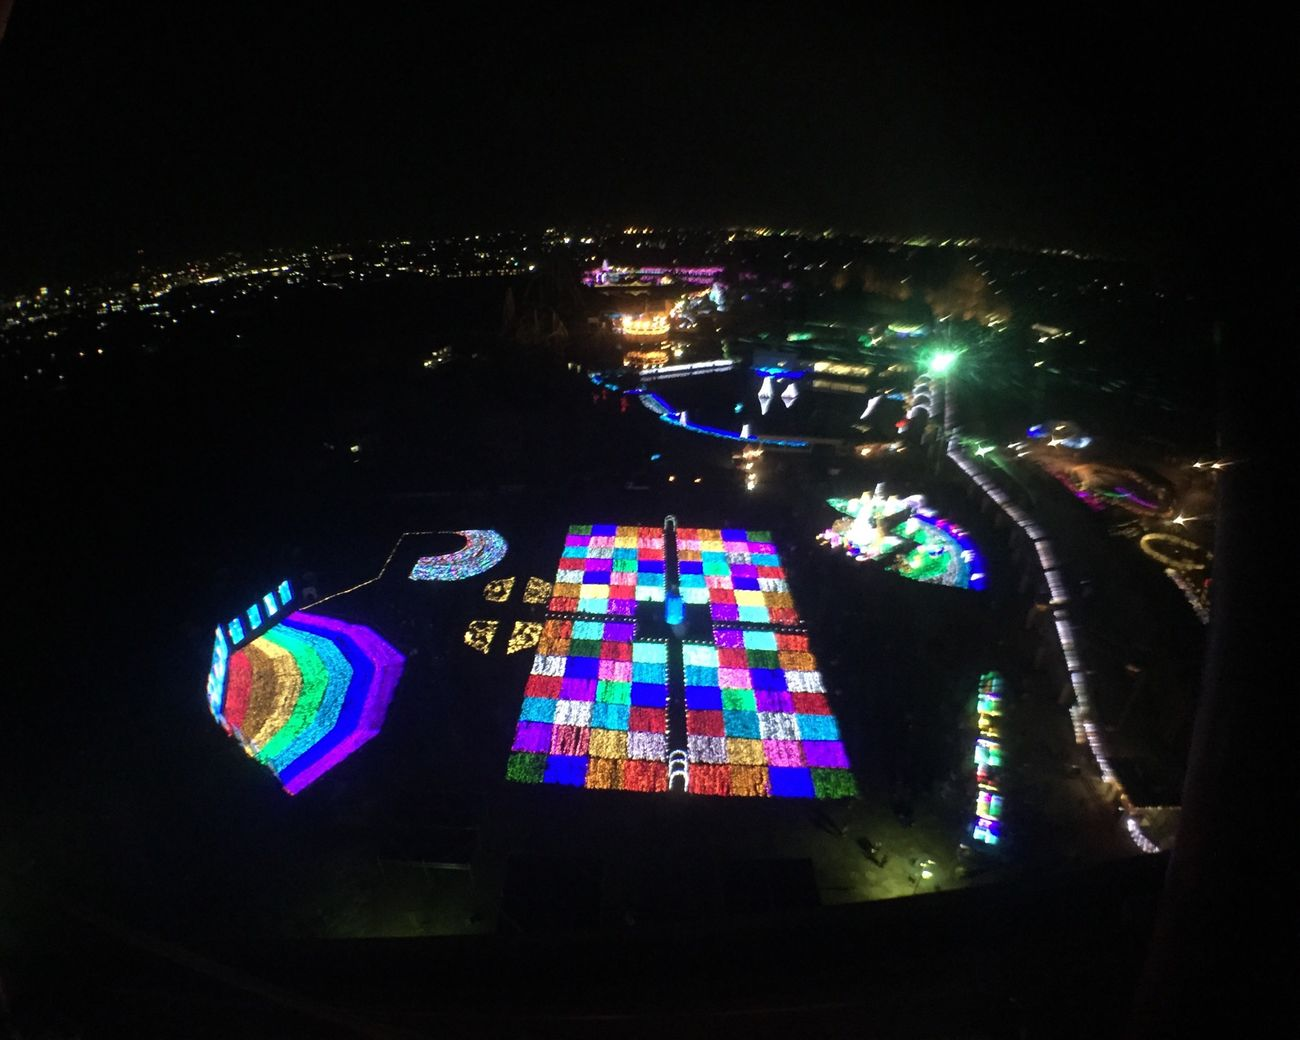 Rainbow Ferris Wheel Light Illumination Christmas Amusementpark Japan Winter 虹 観覧車 遊園地 イルミネーション クリスマス 東武動物公園